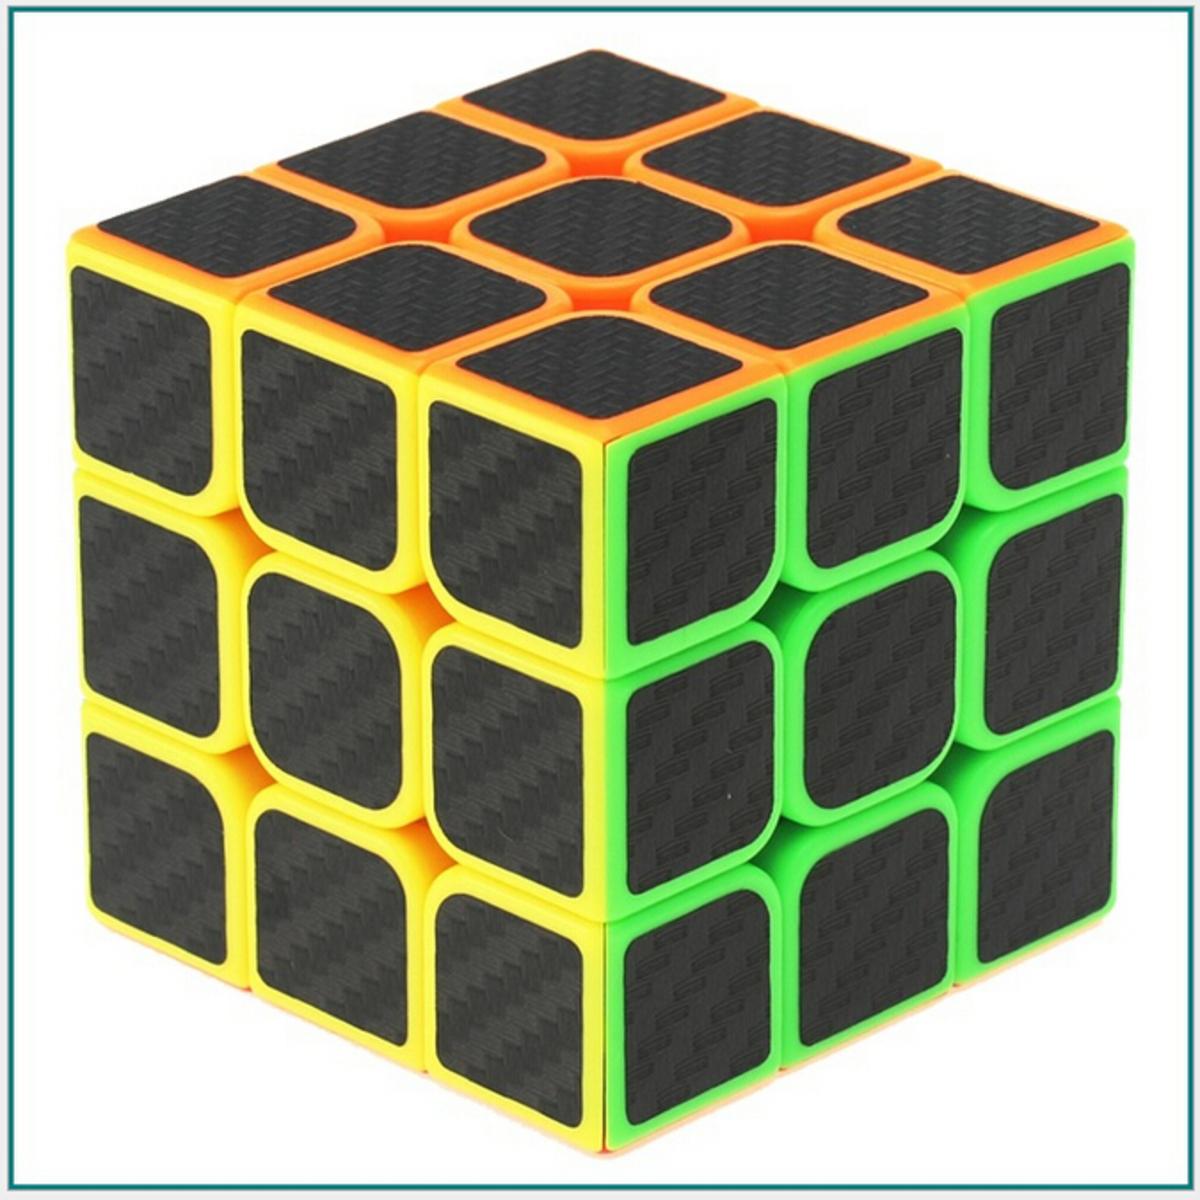 3x3x3 Cobra Fibra Carbono Z-cube